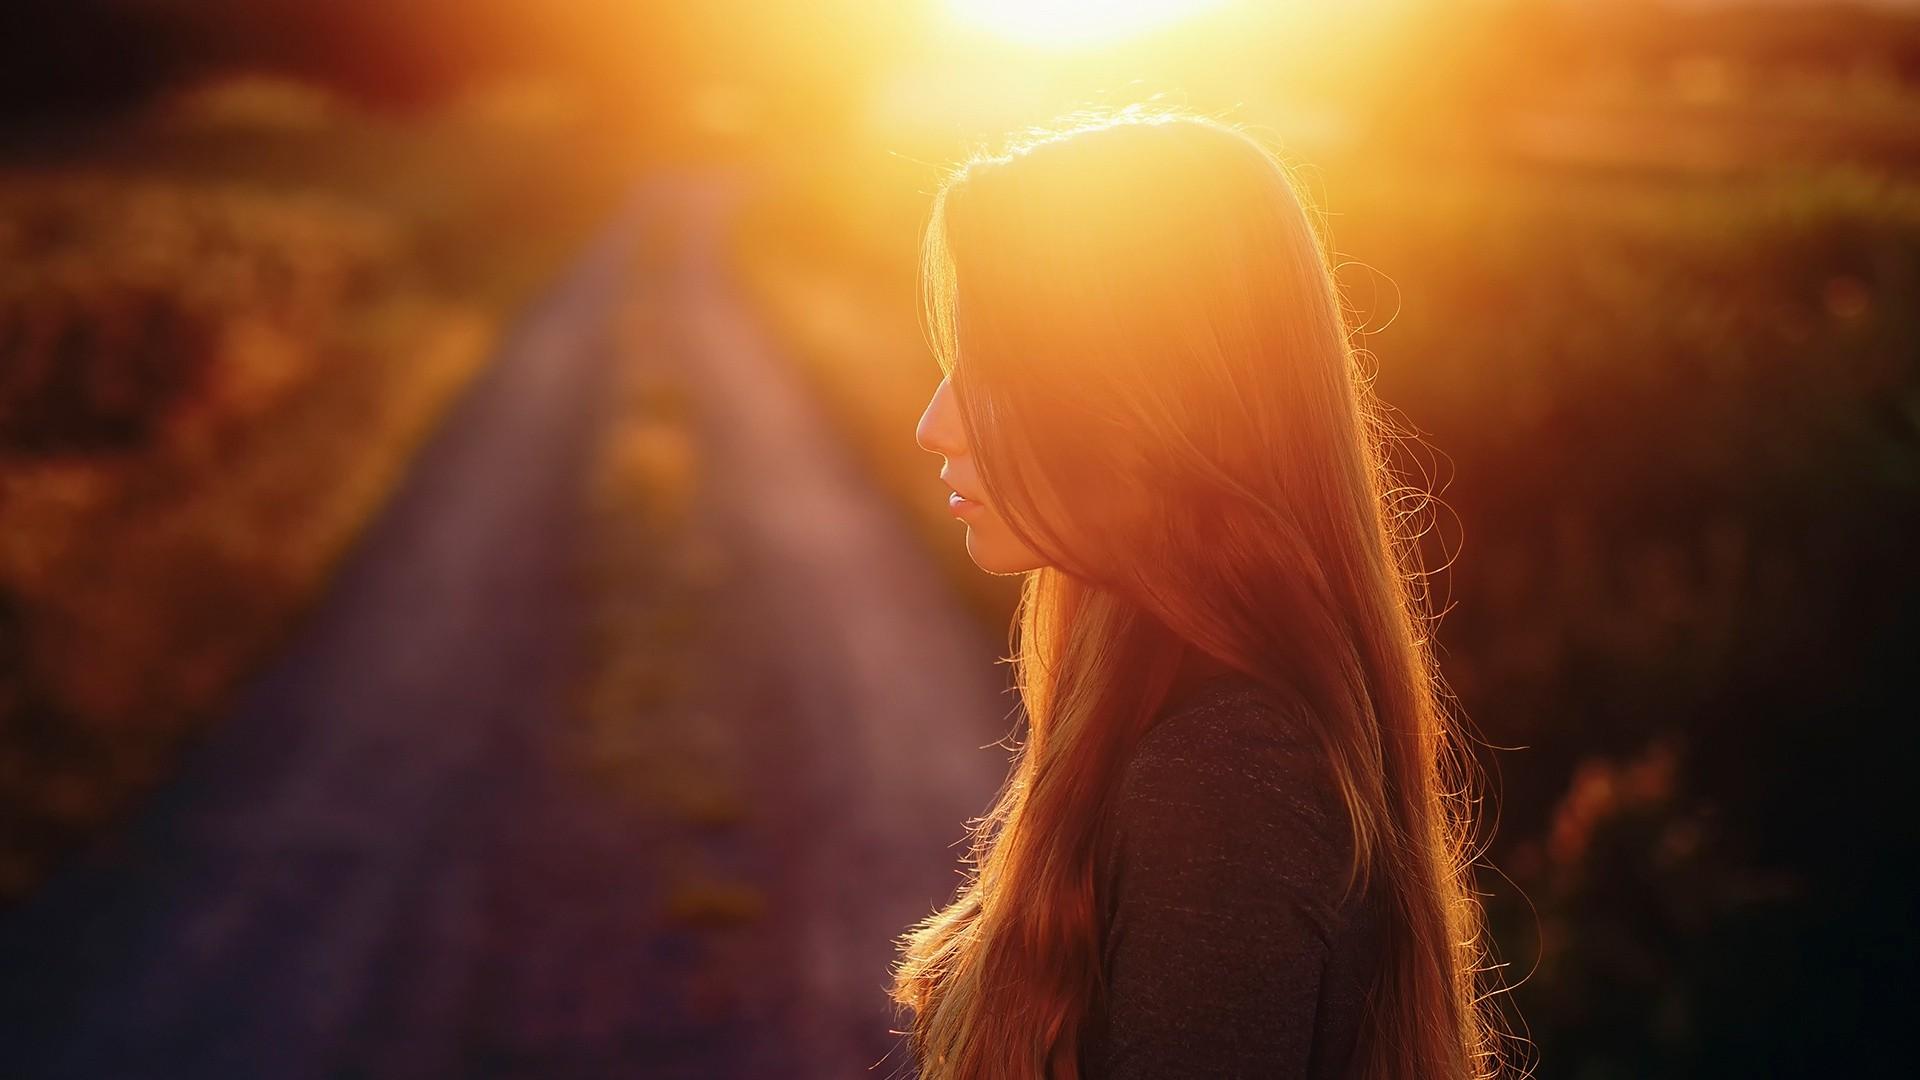 People 1920x1080 sunlight women outdoors long hair road blurred profile women face natural light